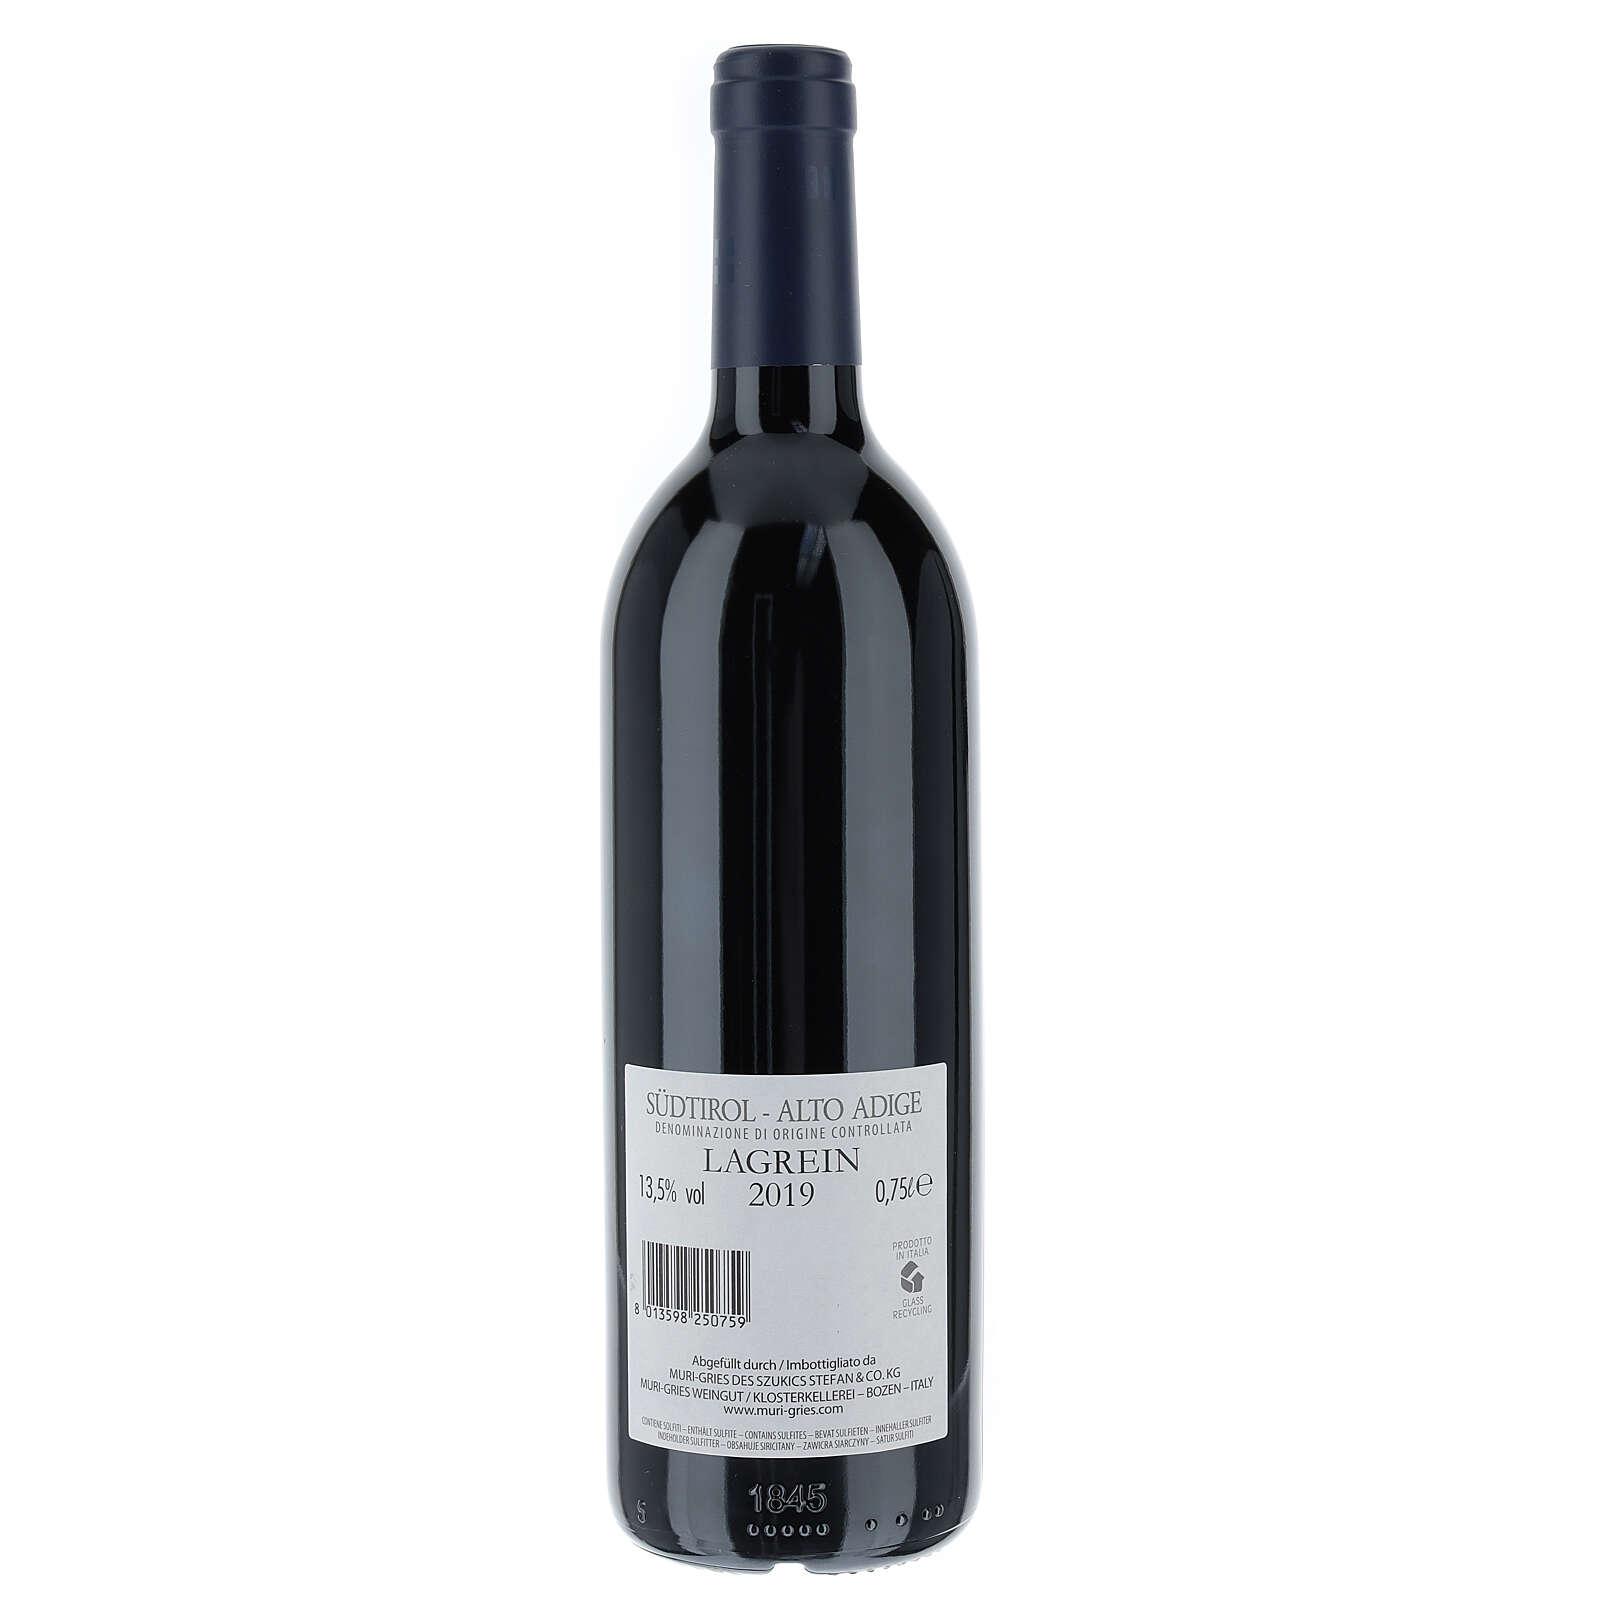 Vino Lagrein DOC 2019 Abadía Muri Gries 750 ml 3